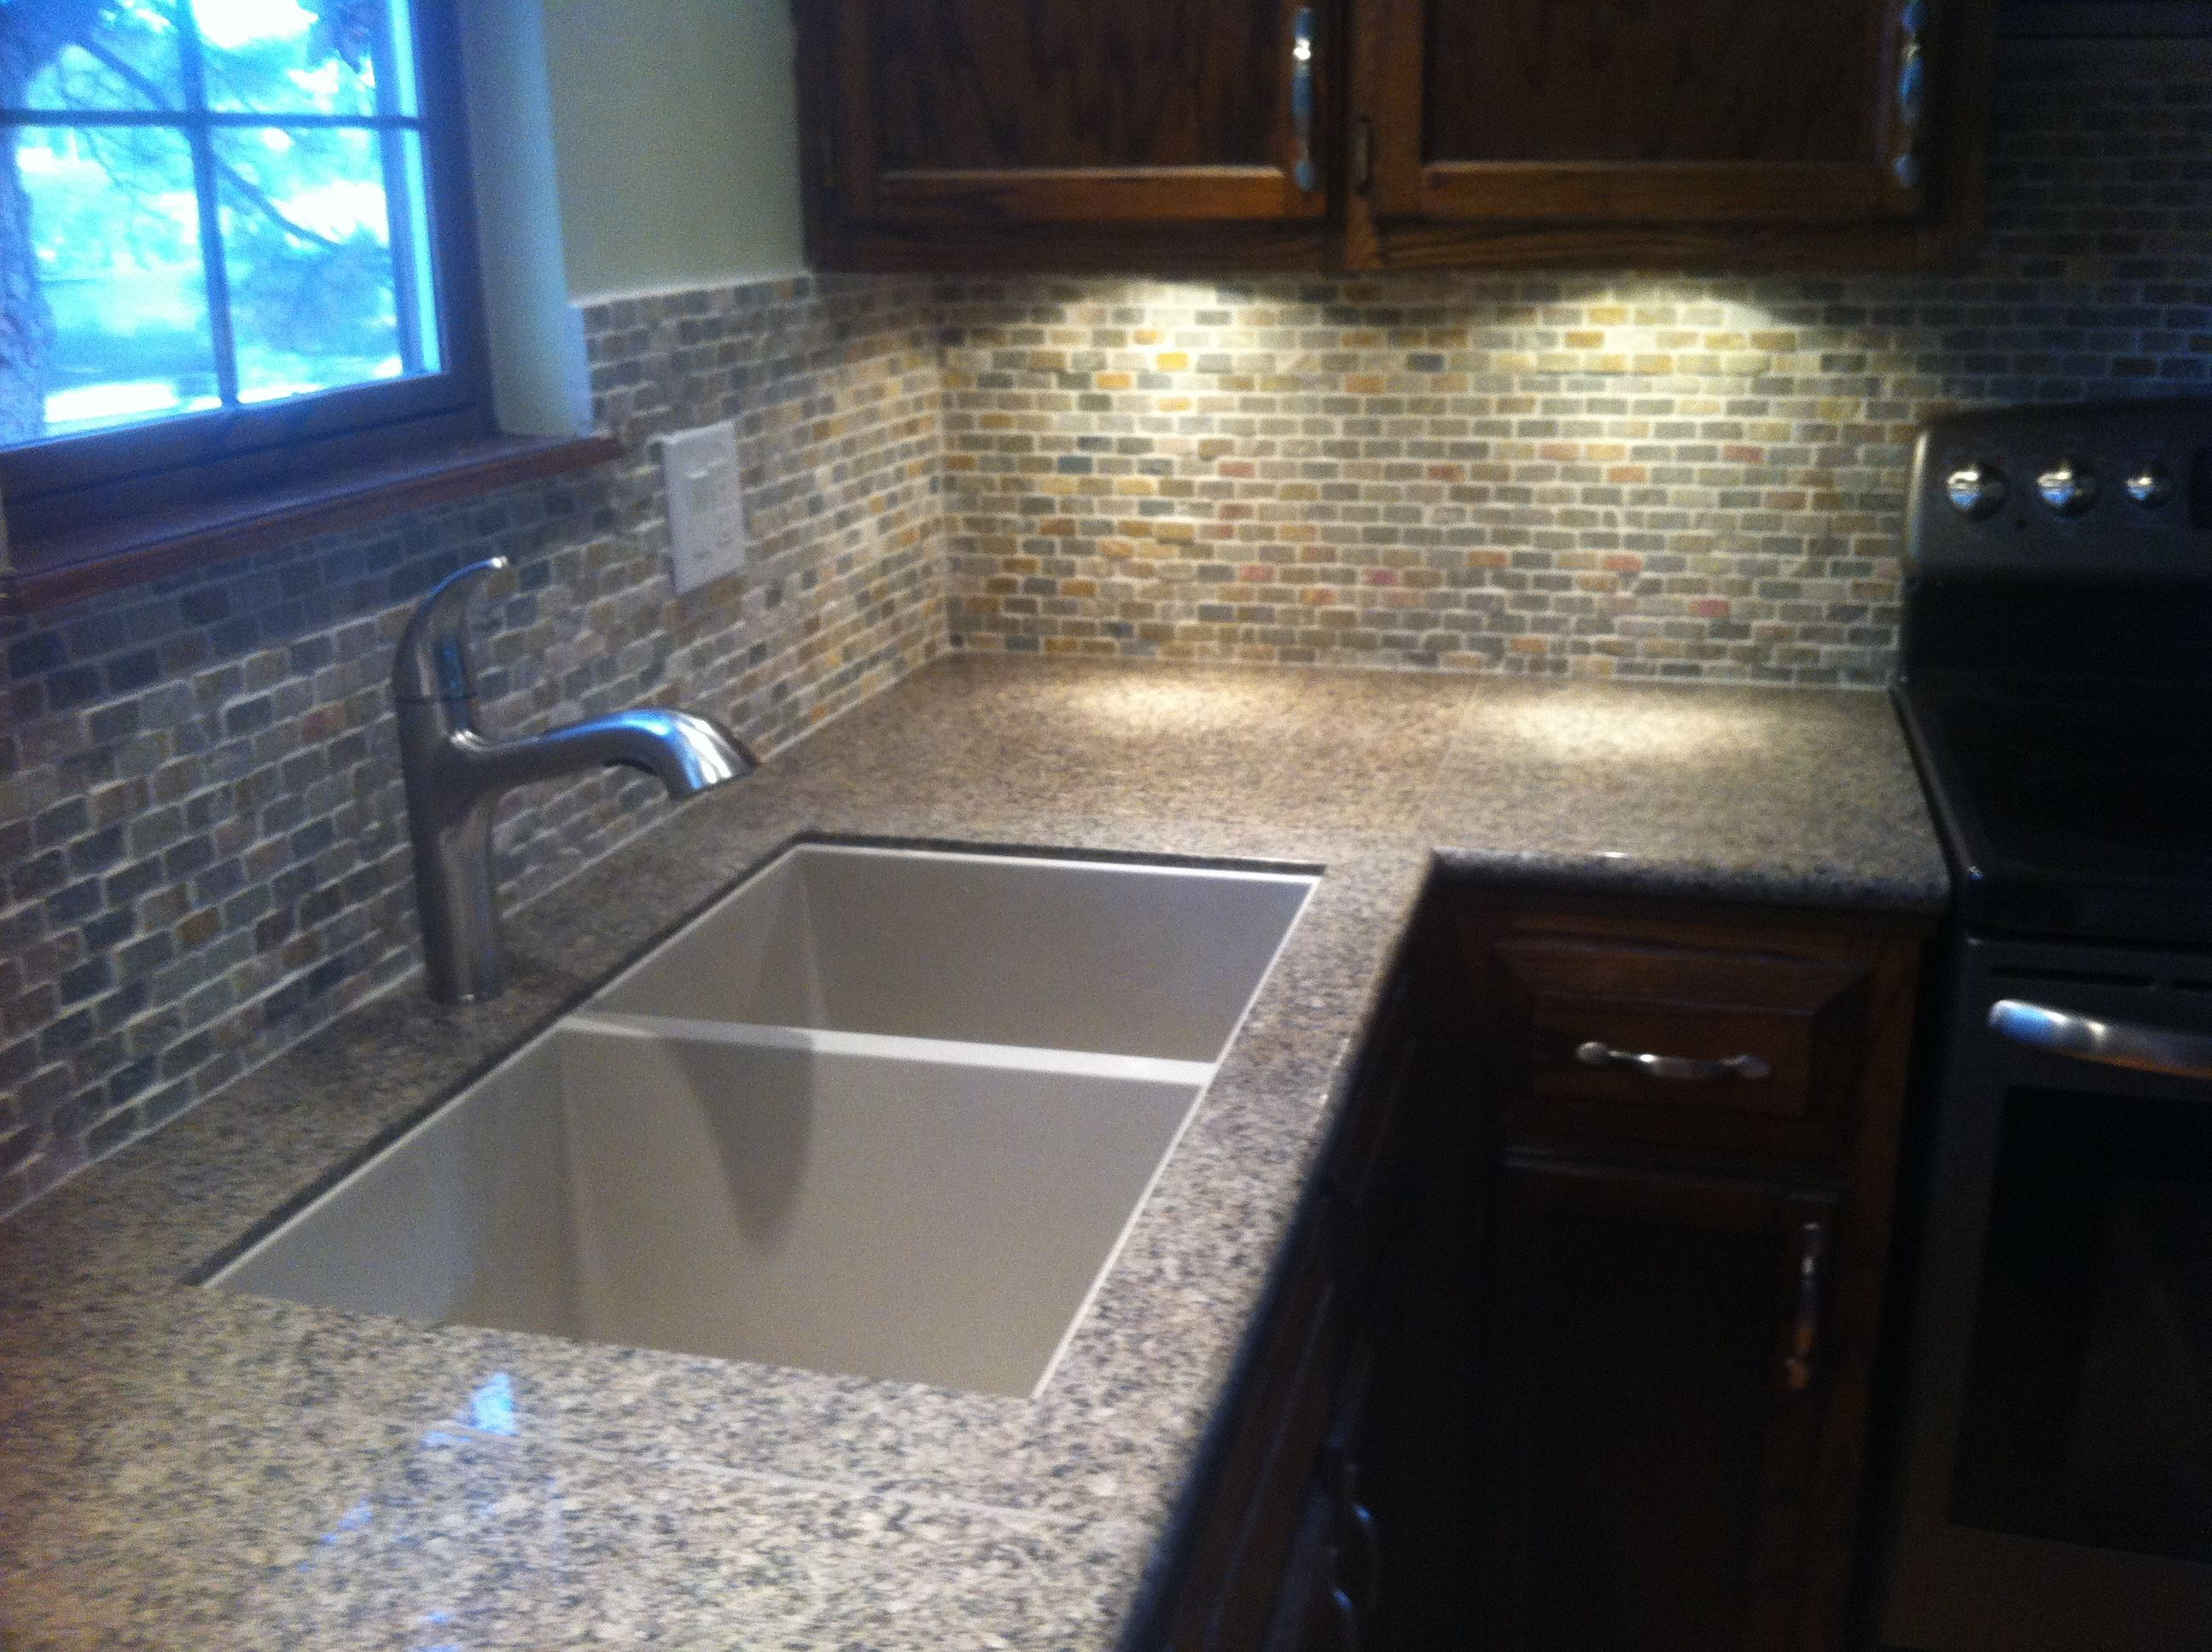 Cheap Prefab Granite Countertops 2020 In 2020 Prefab Granite Countertops Prefab Granite Granite Countertops Kitchen